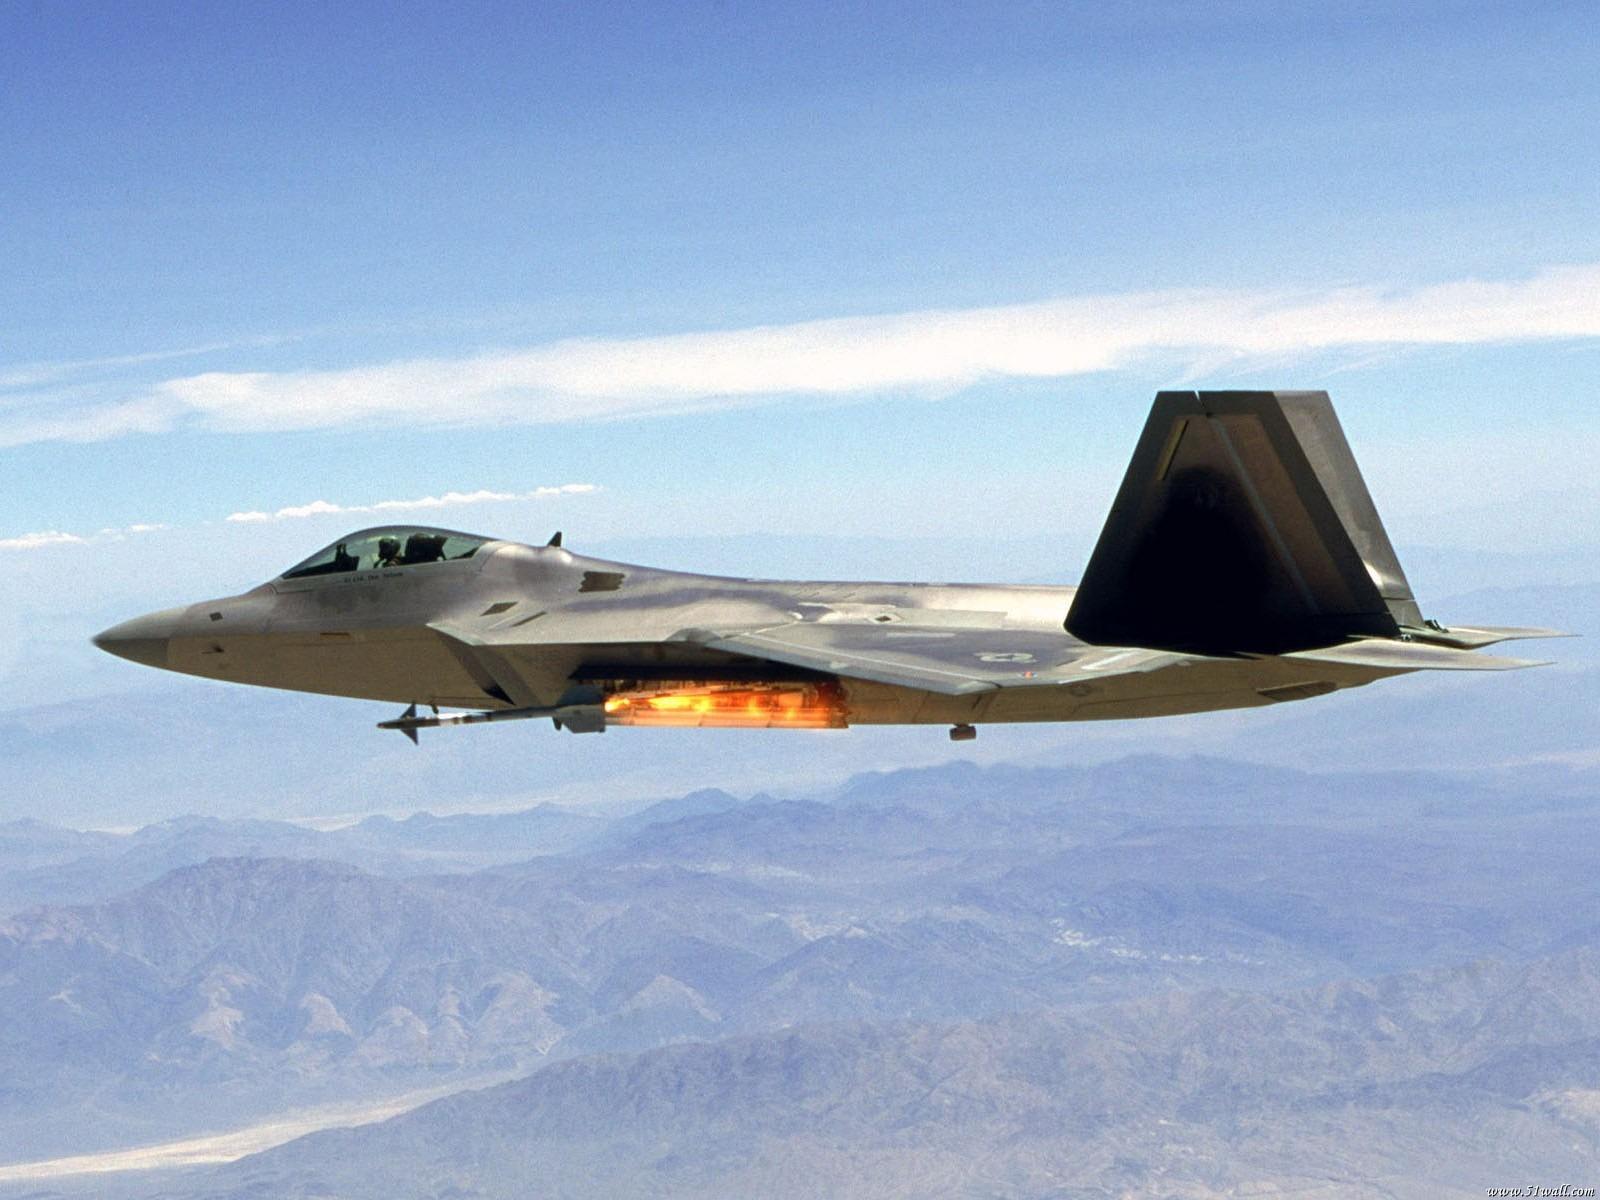 F 22 Raptor Wallpaper: Lockheed Martin F-22 Raptor Wallpaper And Background Image